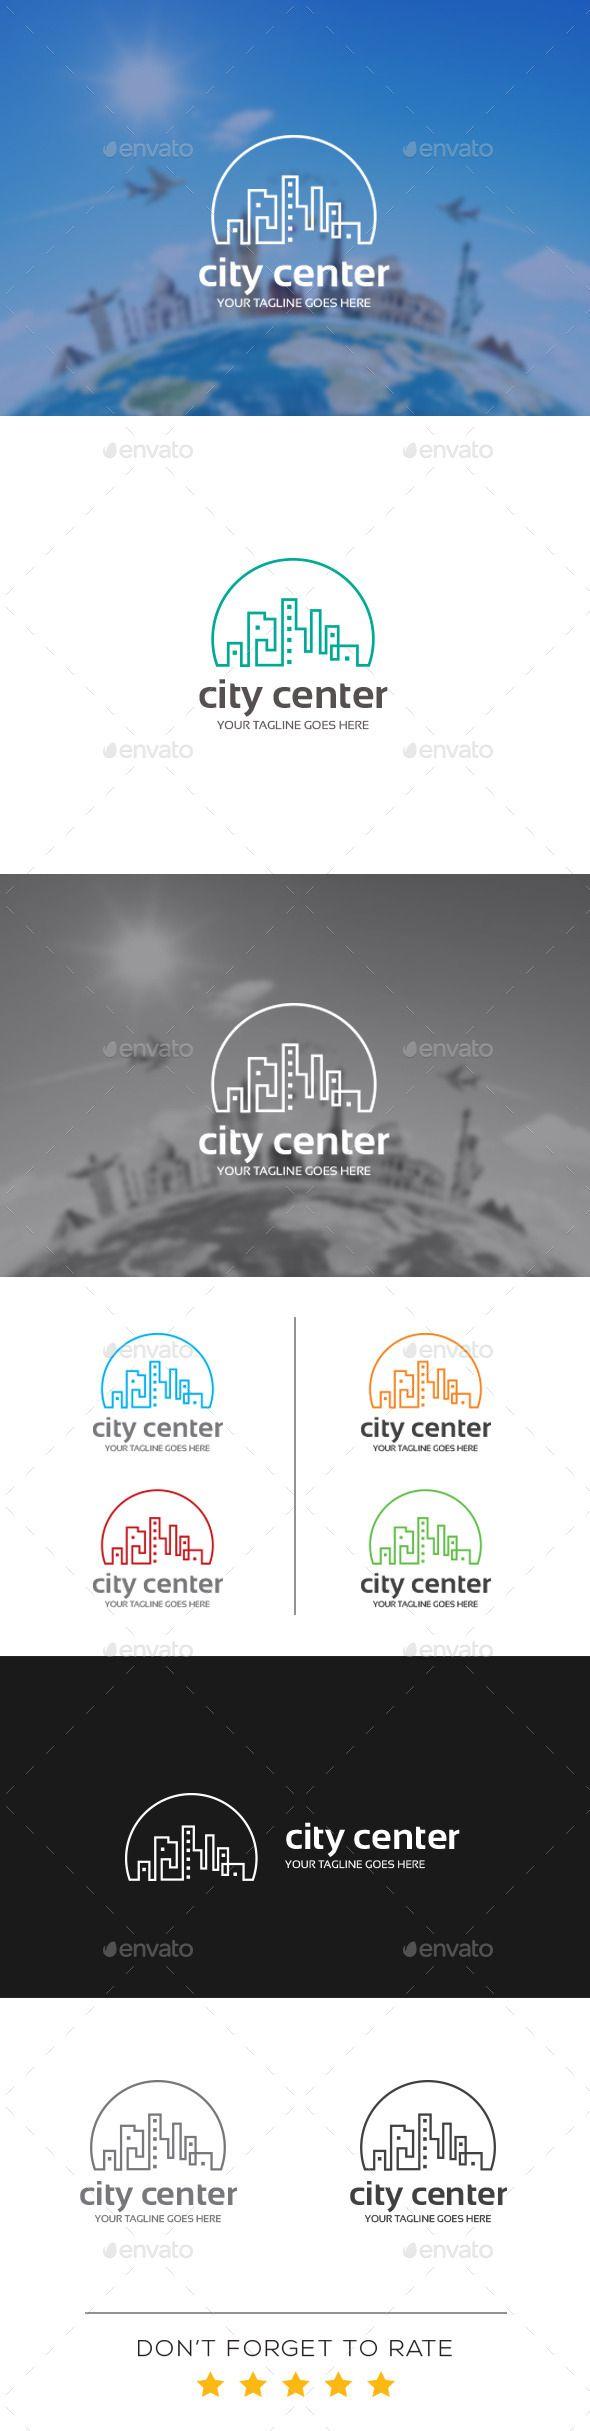 City Center Logo Tempalte #design #logotype Download: http://graphicriver.net/item/city-center-logo-template/10939346?ref=ksioks